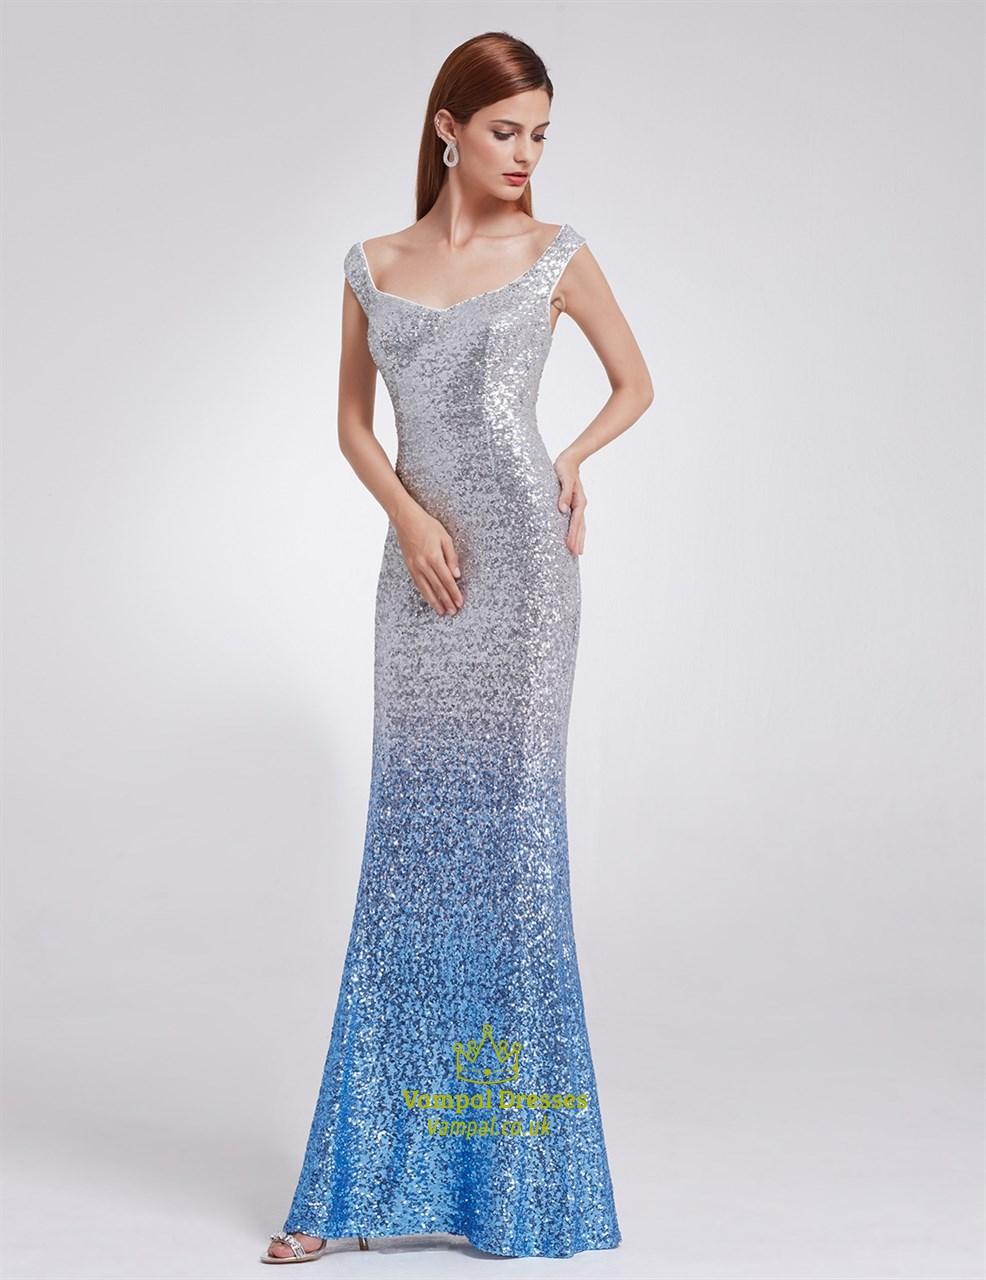 Ombre Long Mermaid Evening Dresses | Vampal Dresses